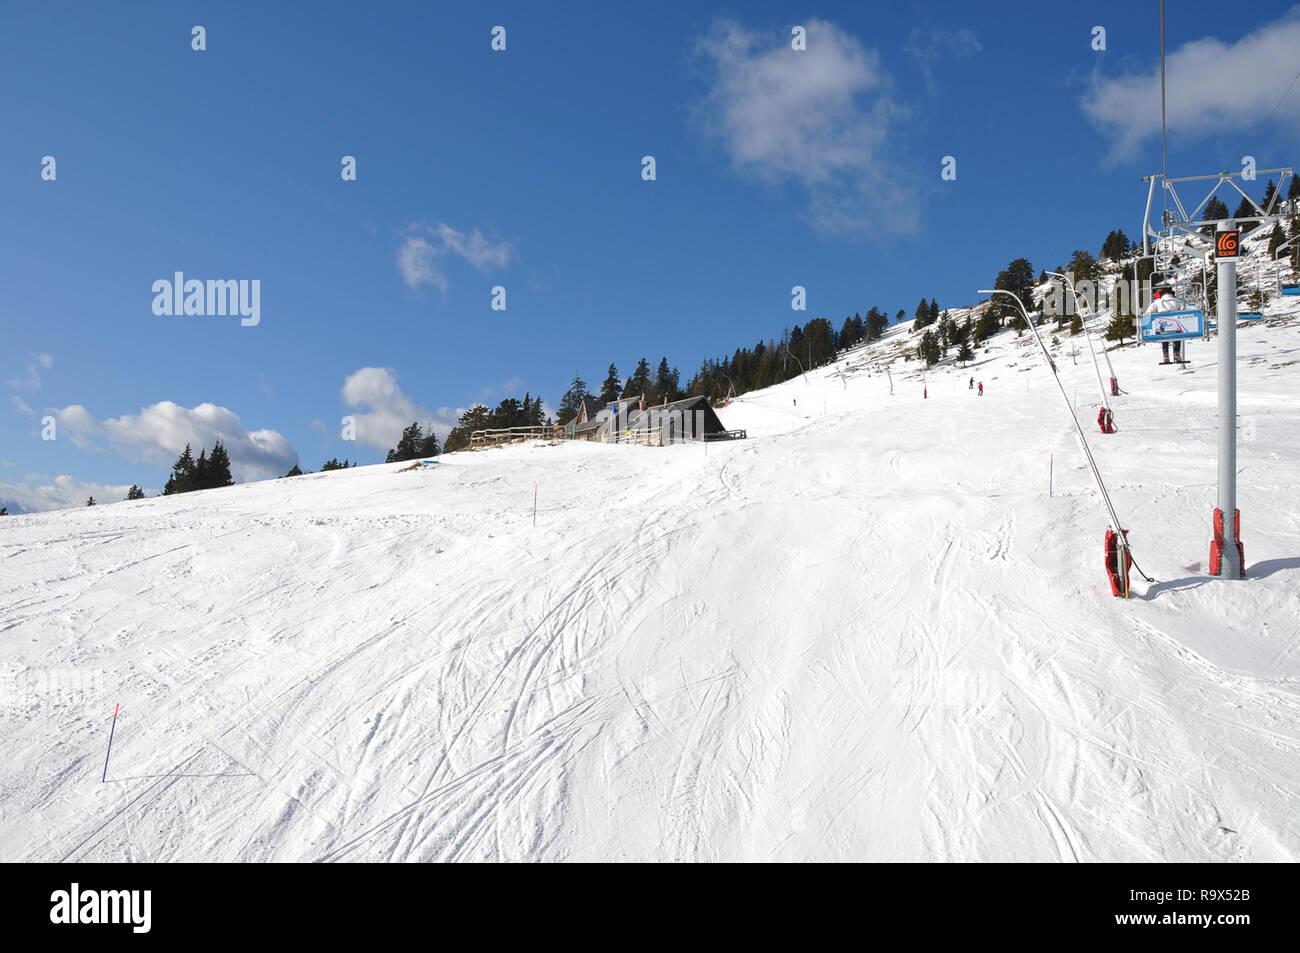 krvavec, slovenia - 8 january 2012: krvavec alpine mountain ski